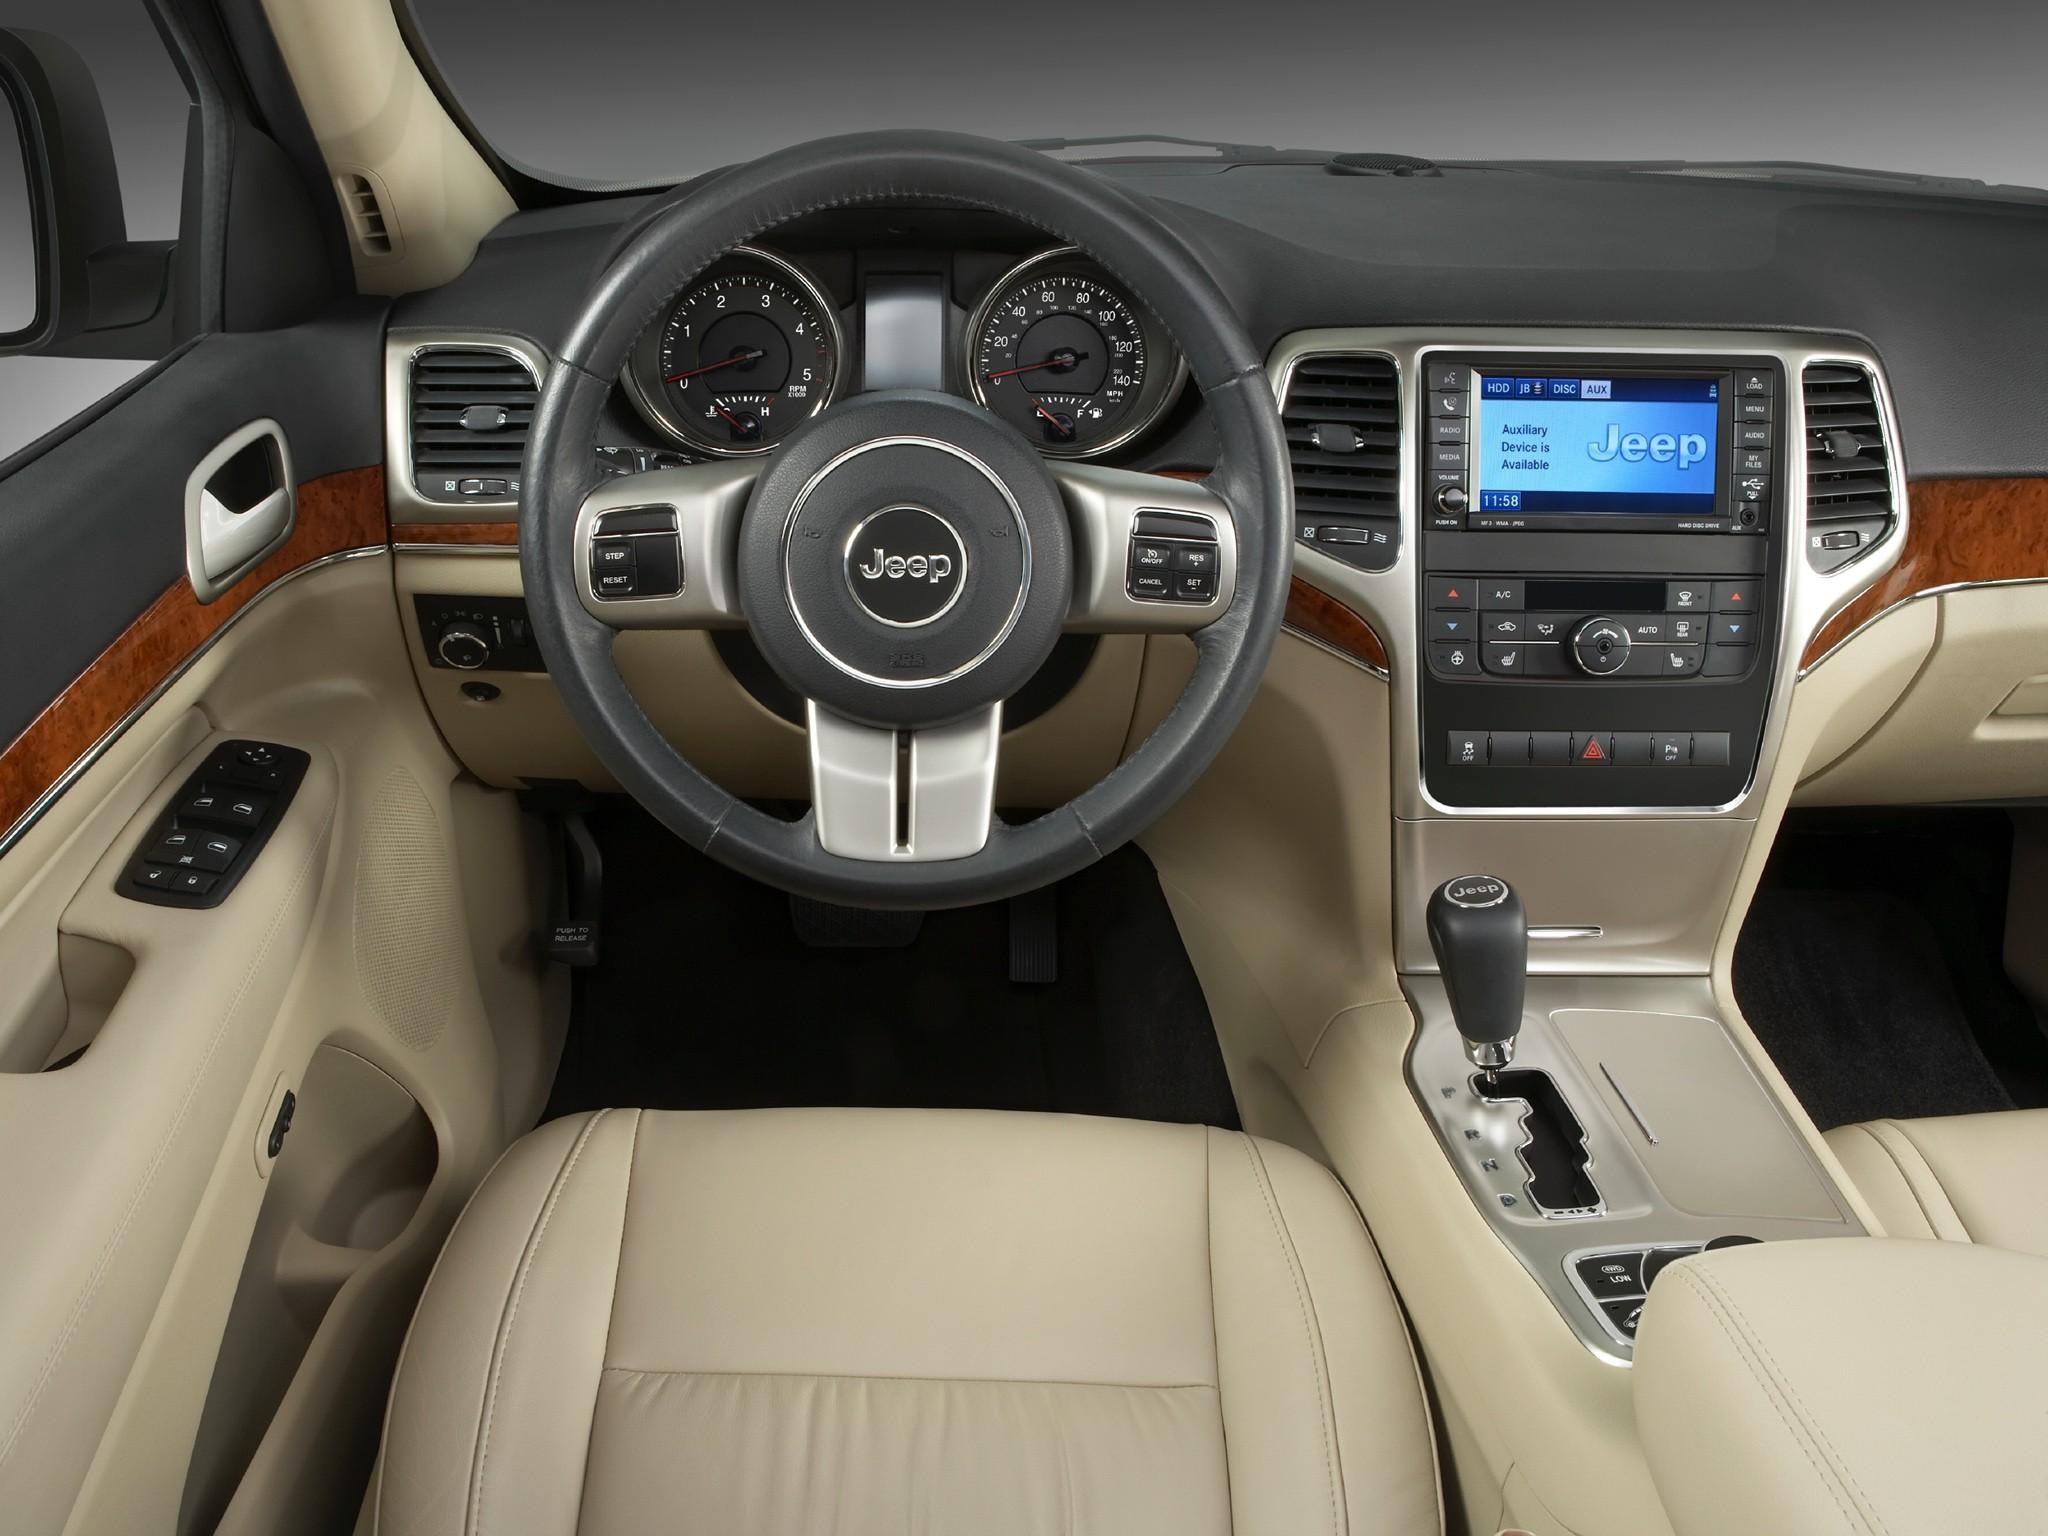 jeep grand cherokee specs - 2010, 2011, 2012, 2013 - autoevolution